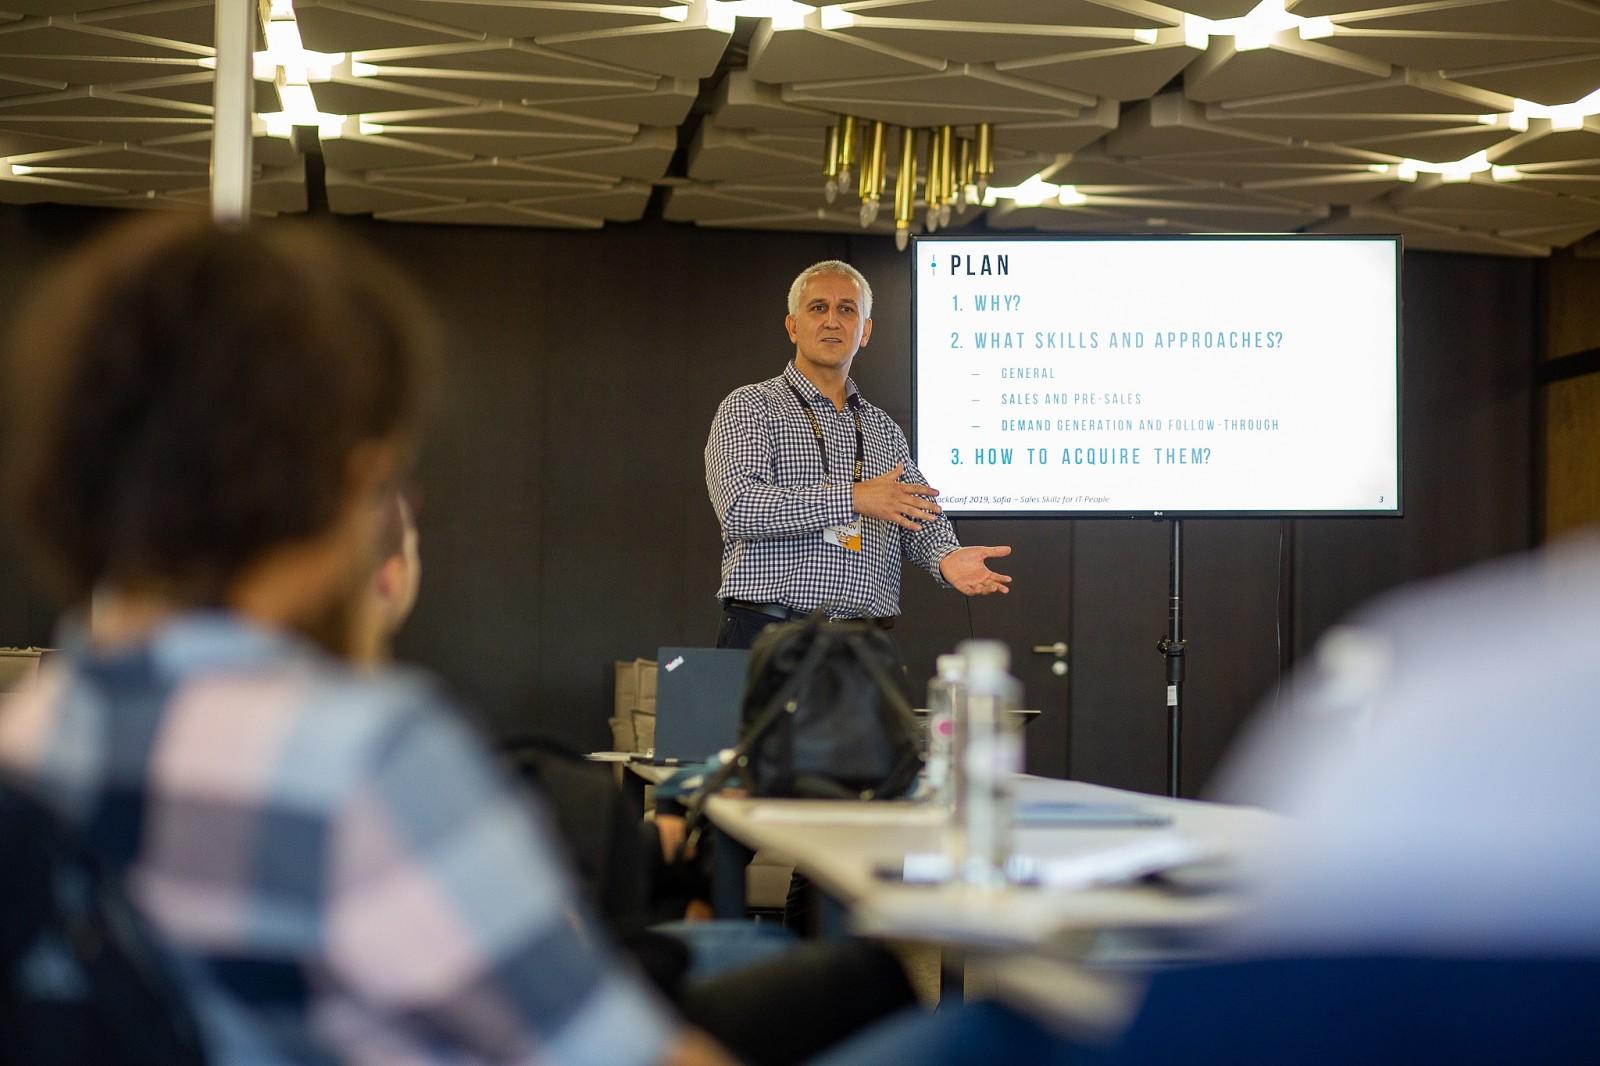 [ workshop ] Sales Skills for IT People